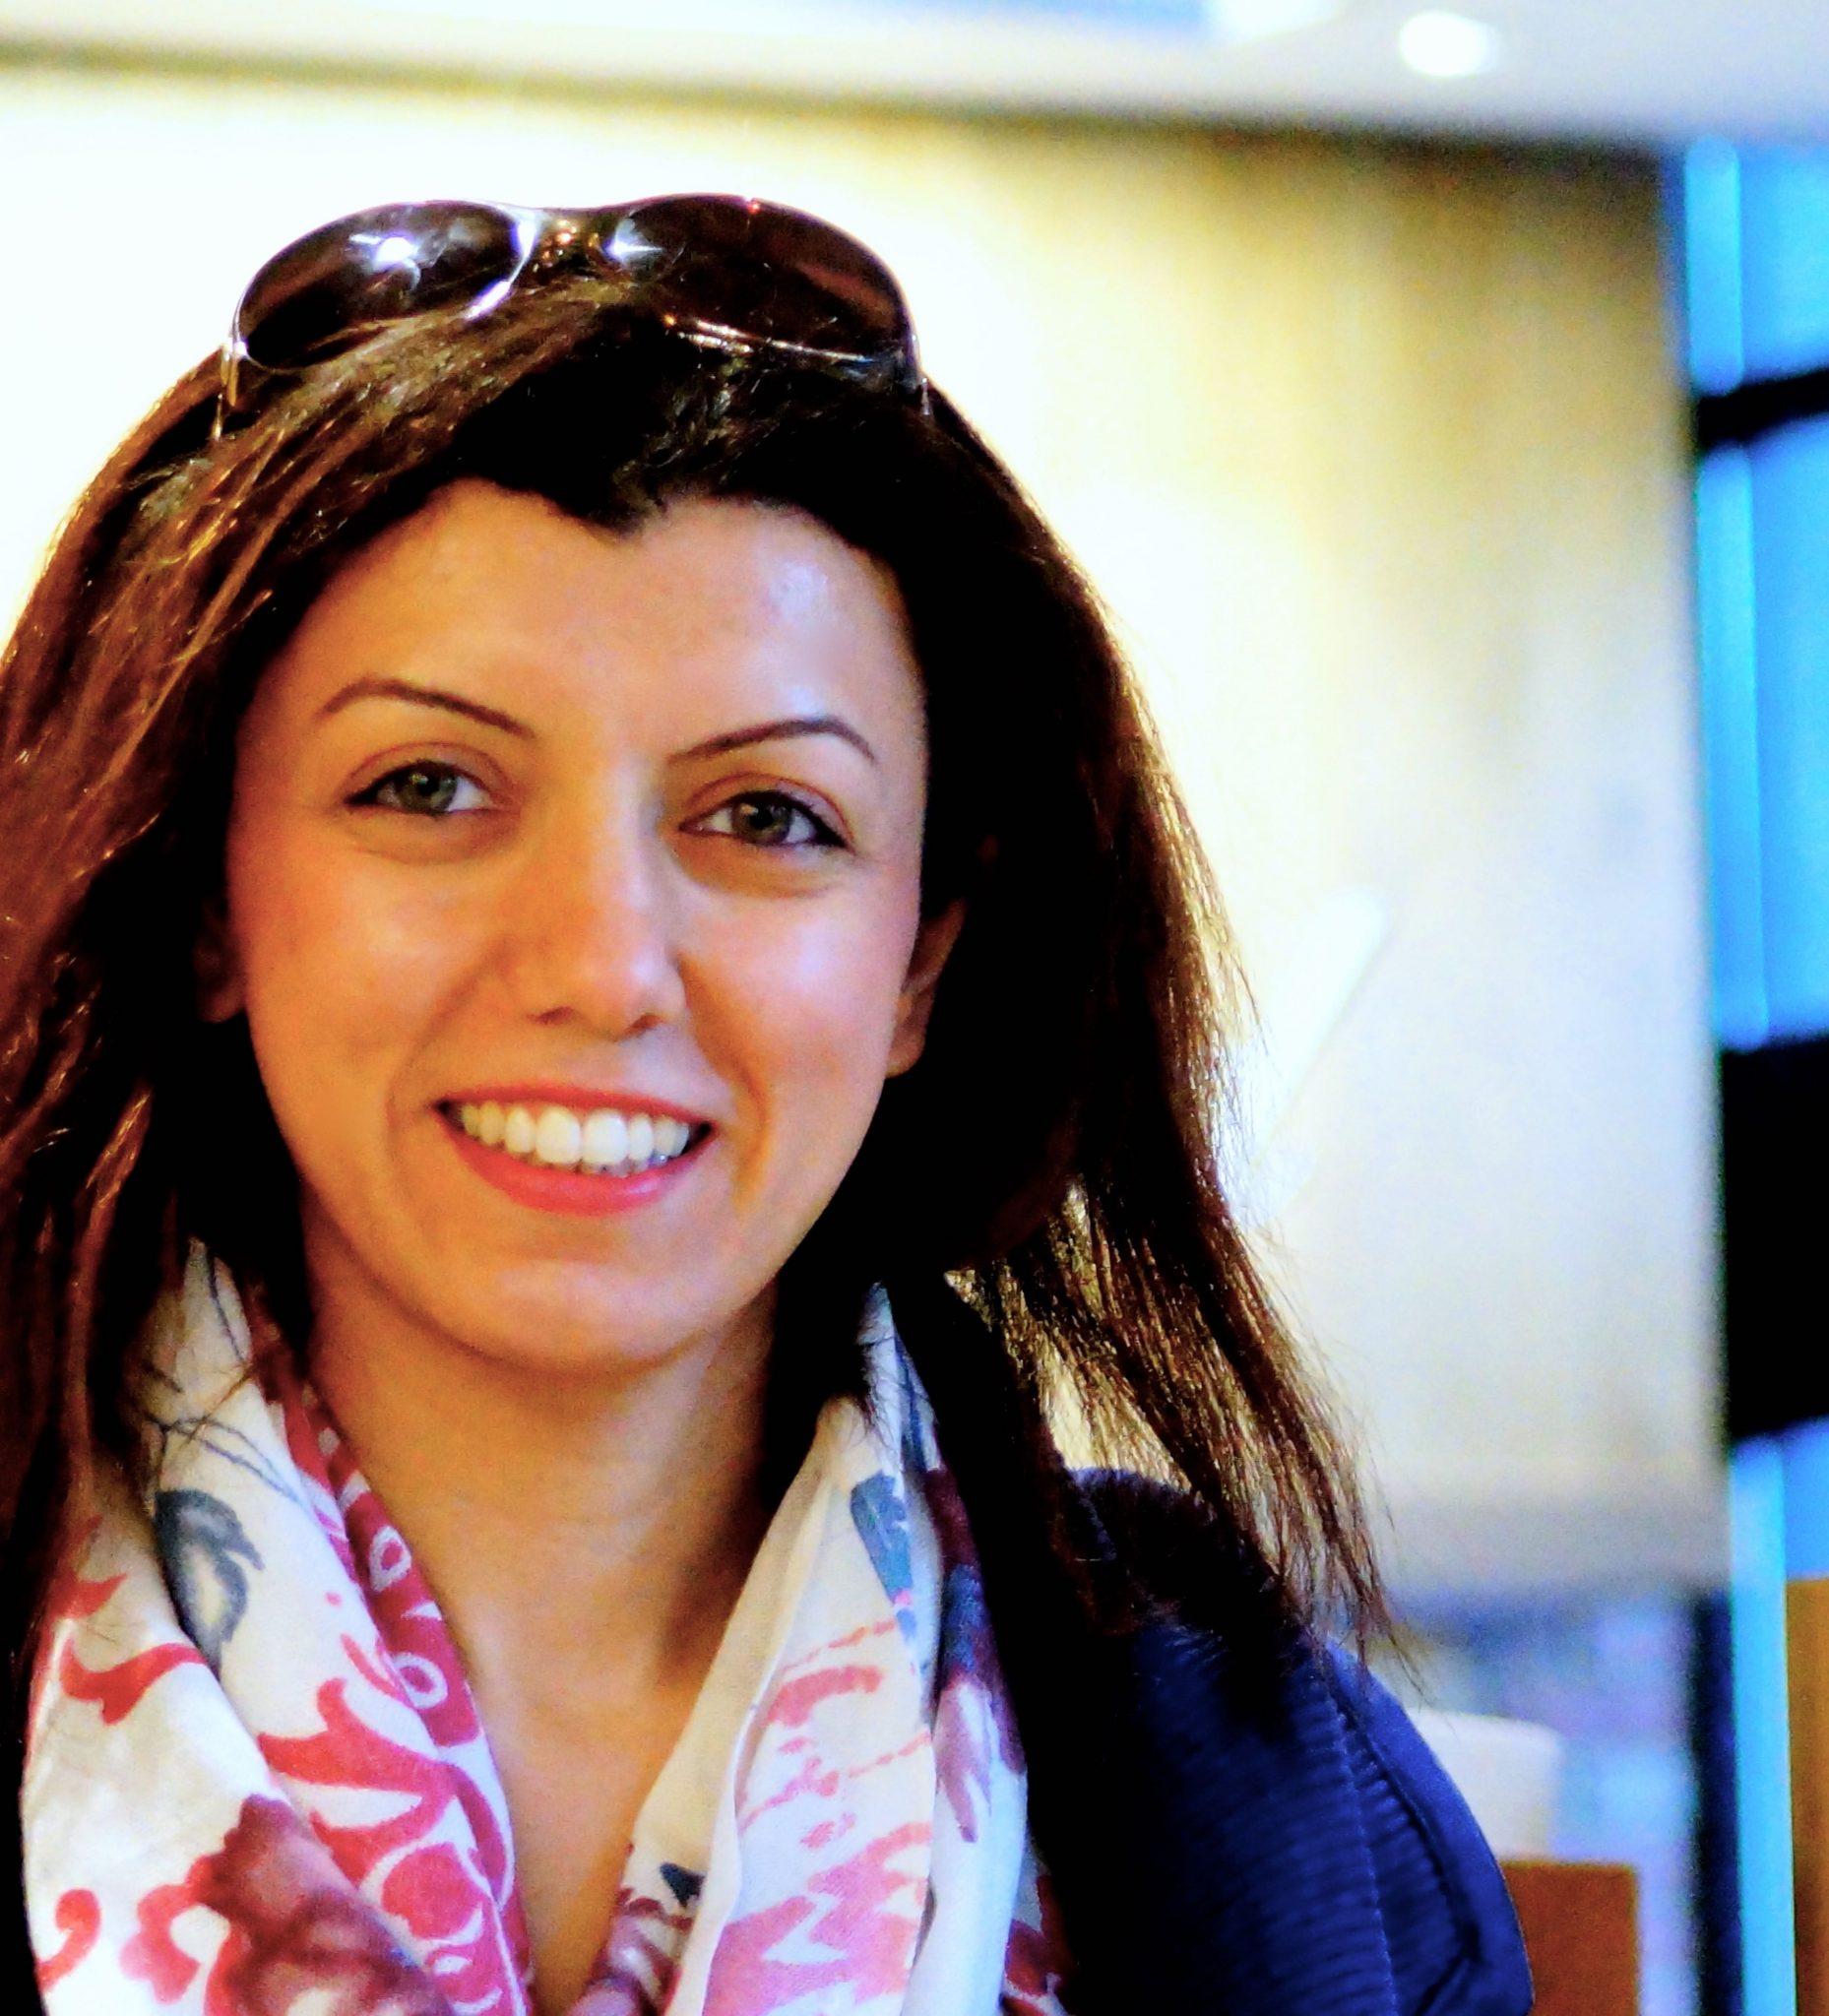 Mina Karzand